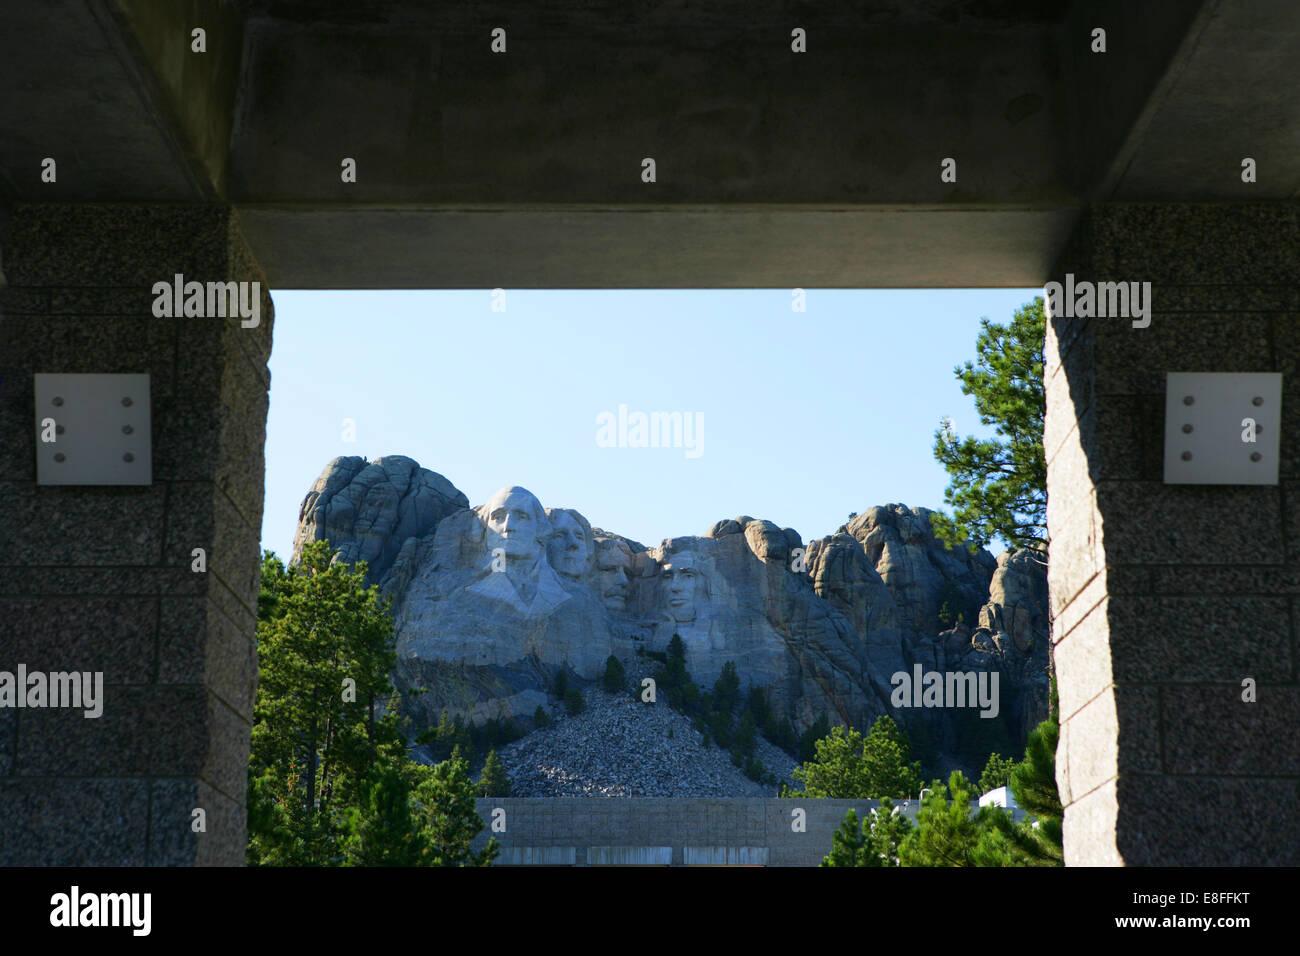 Mount Rushmore National Memorial, South Dakota, Amerika, USA Stockbild